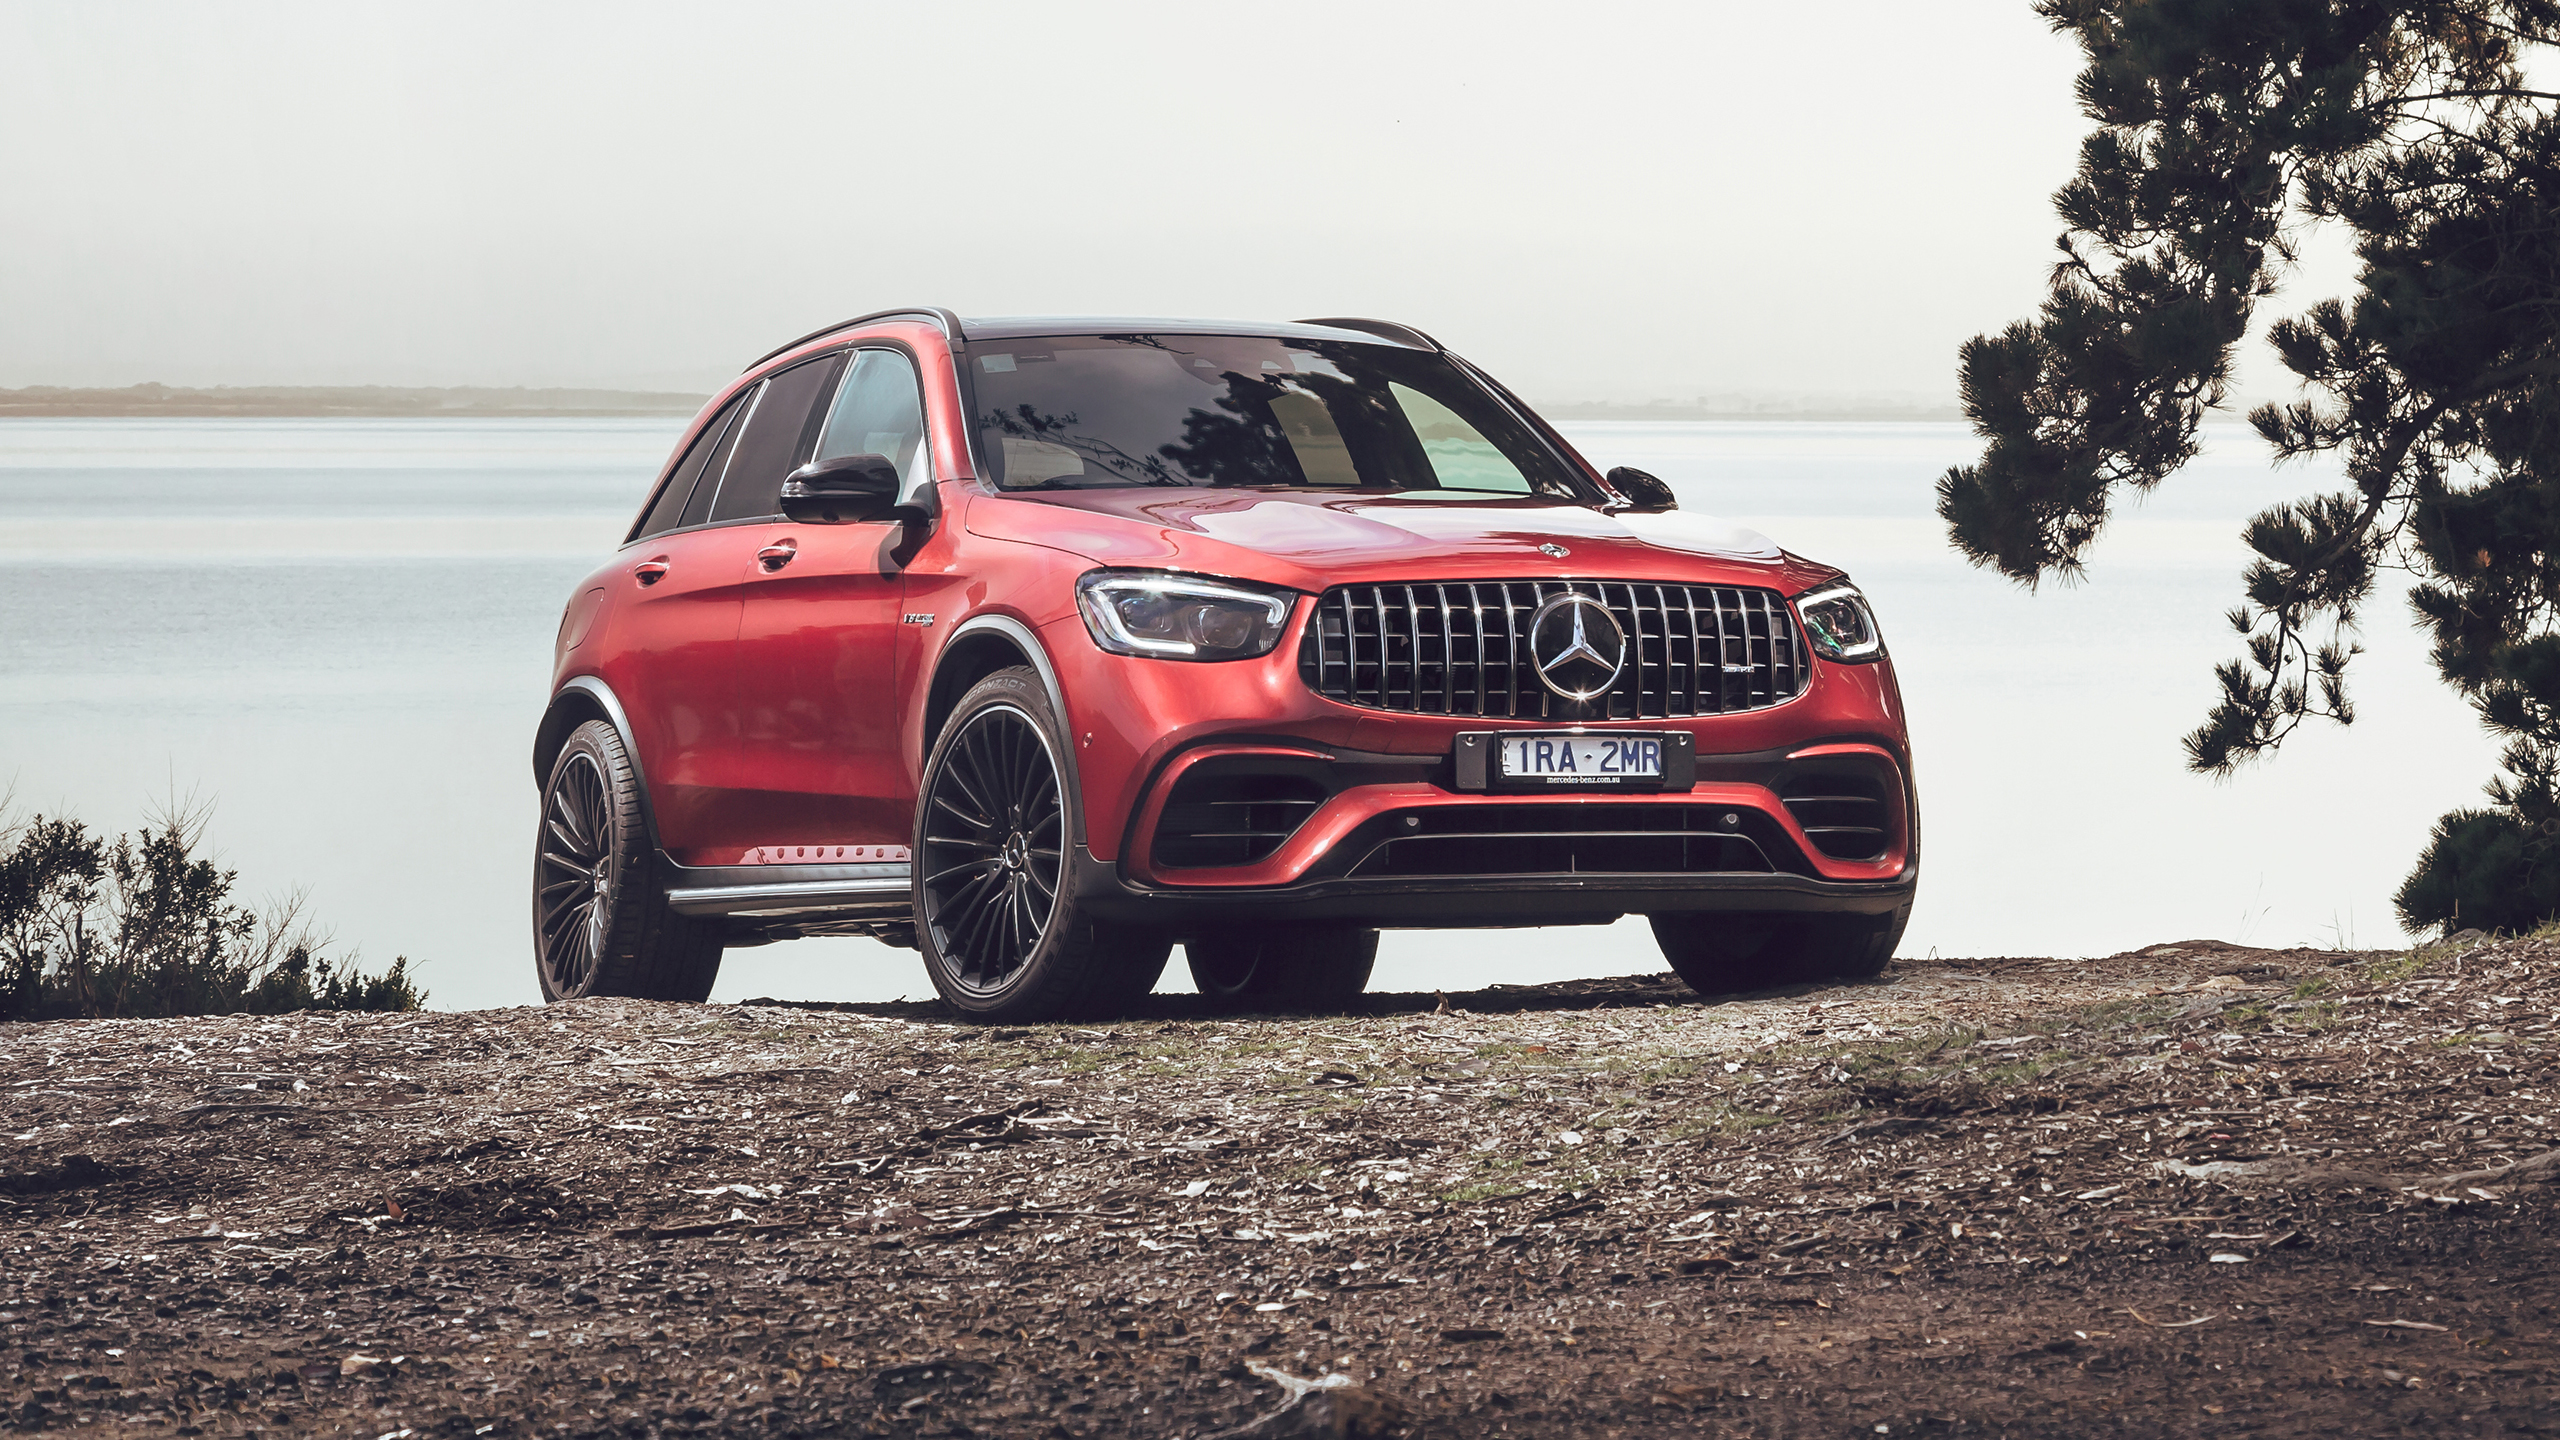 Mercedes Amg Glc 63 S 4matic 2020 Wallpaper Hd Car Wallpapers Id 14395